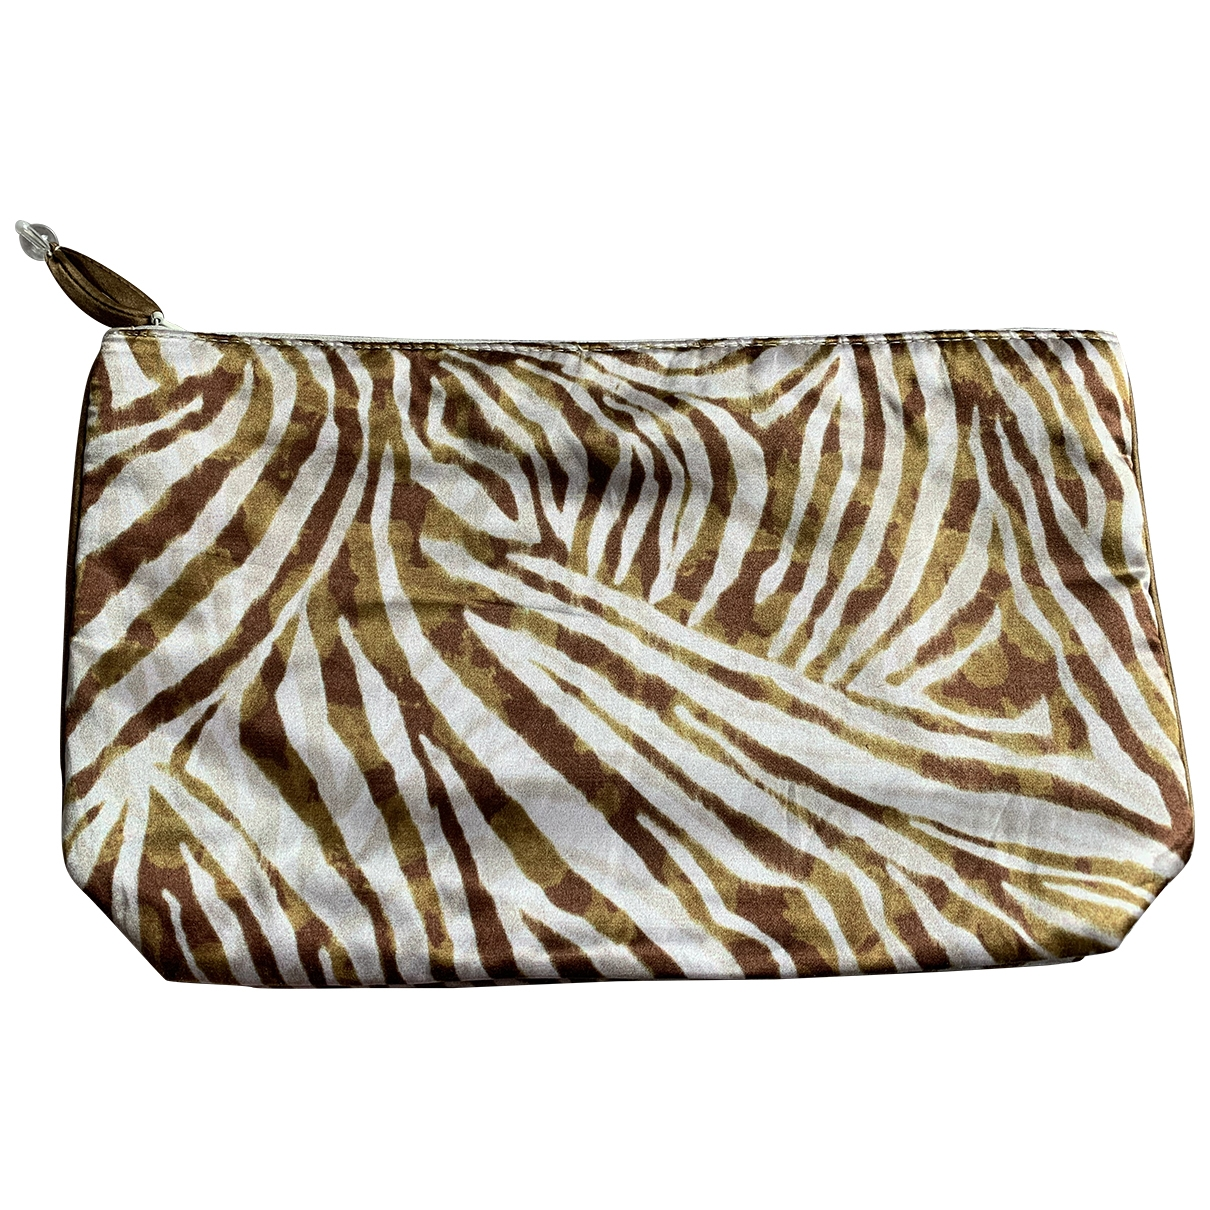 Zara \N Multicolour Silk Clutch bag for Women \N